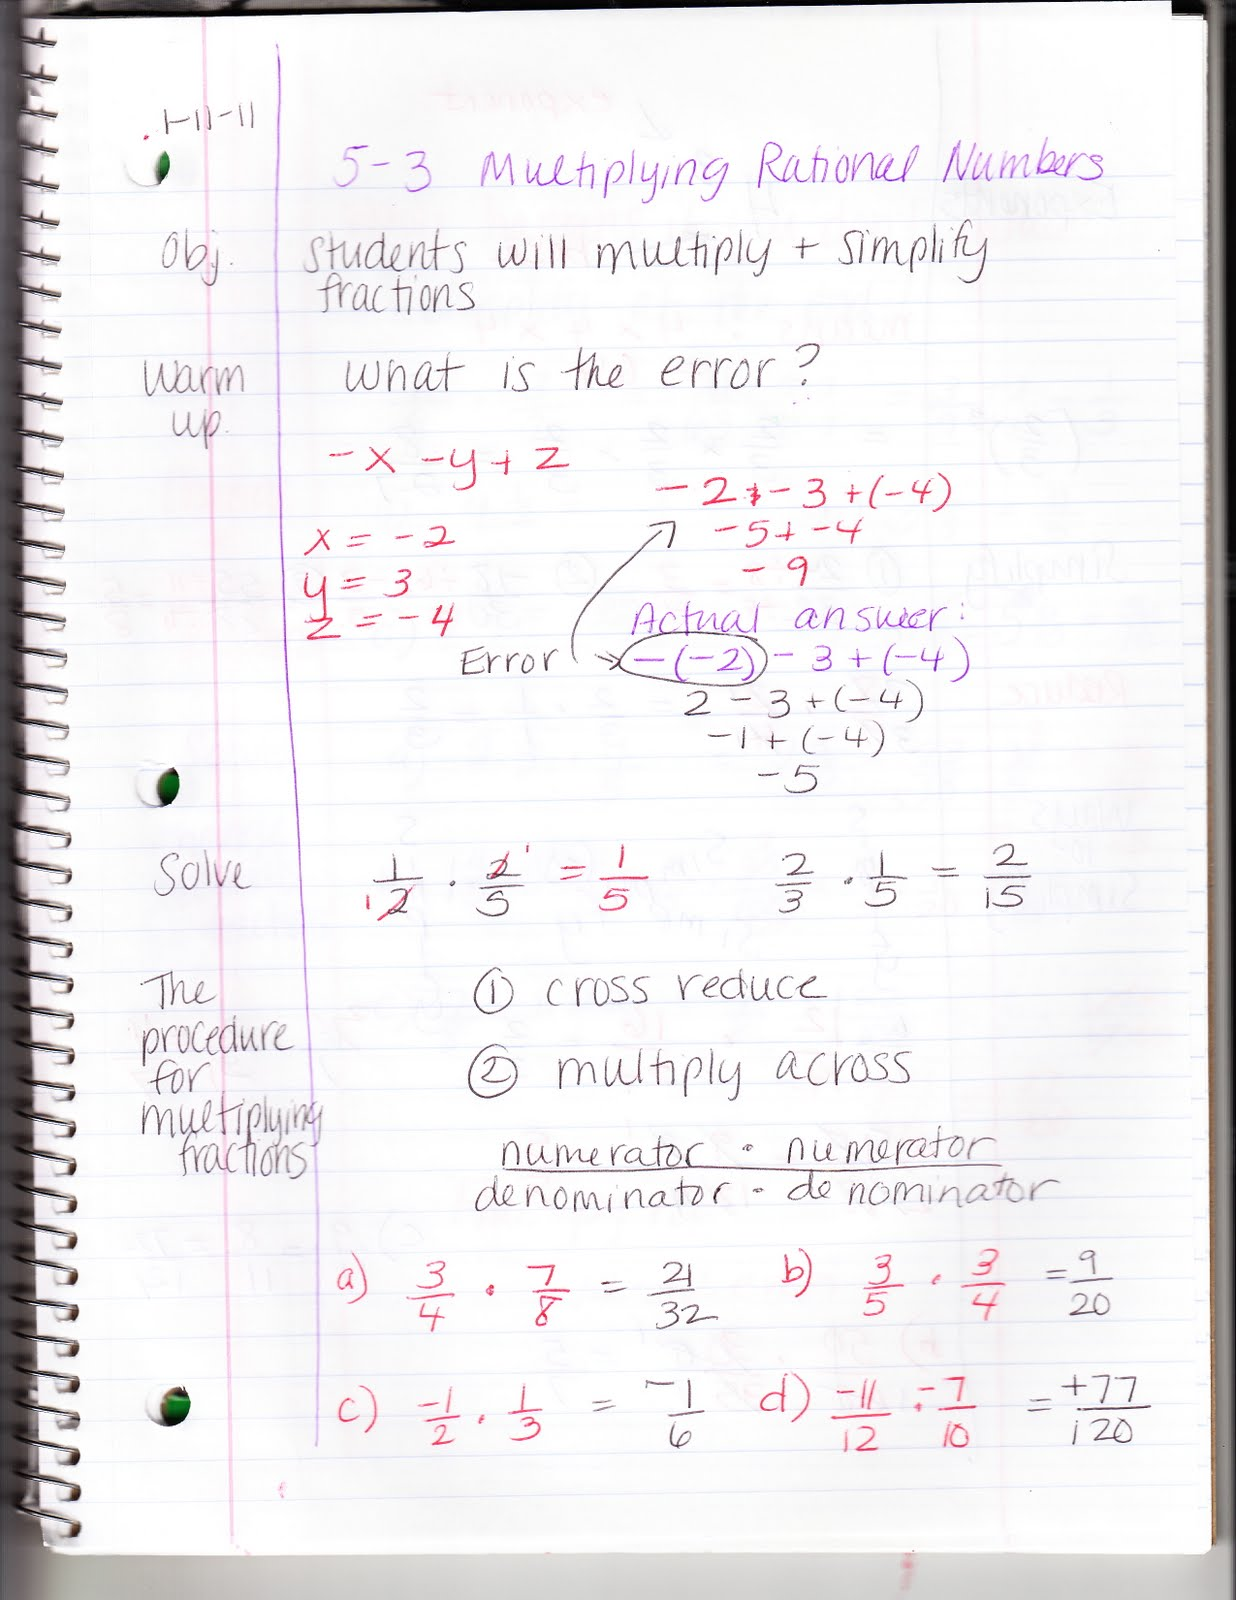 Ms Jean S Algebra Readiness Blog 5 3 Multiplying